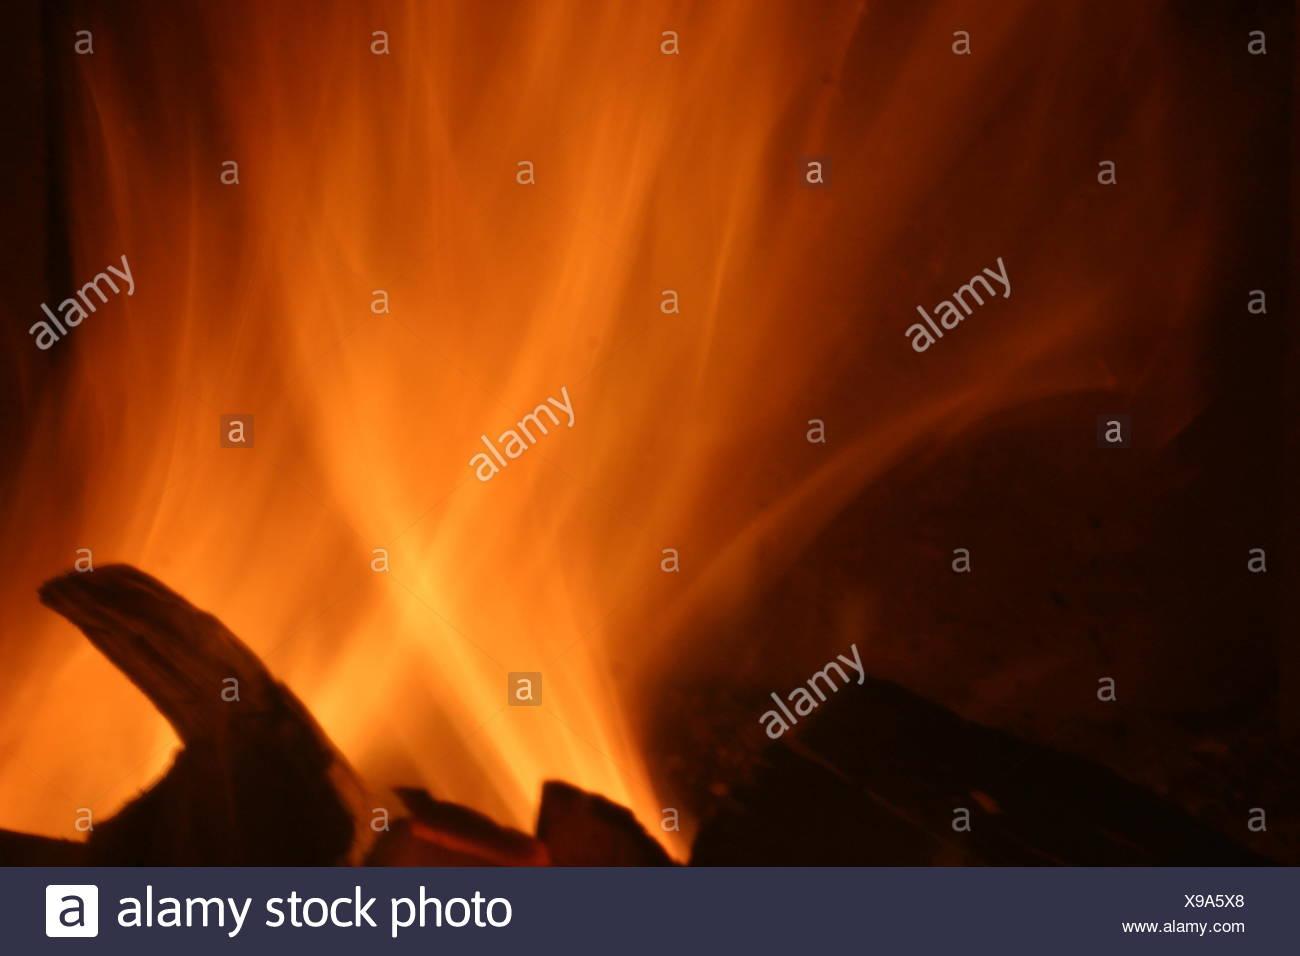 elemental force - Stock Image